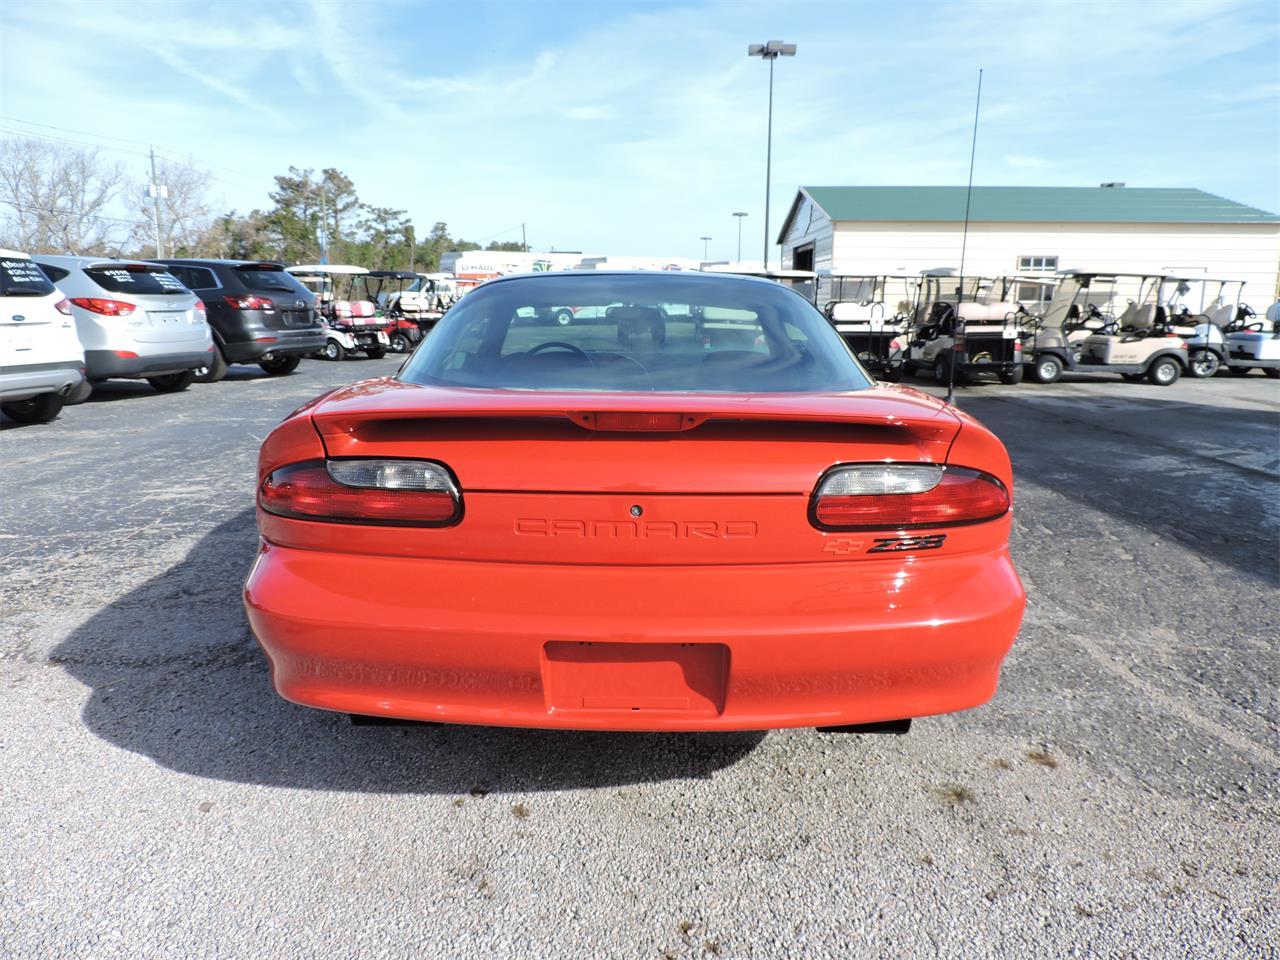 1994 Chevrolet Camaro Z28 (CC-1316407) for sale in Beaufort, North Carolina